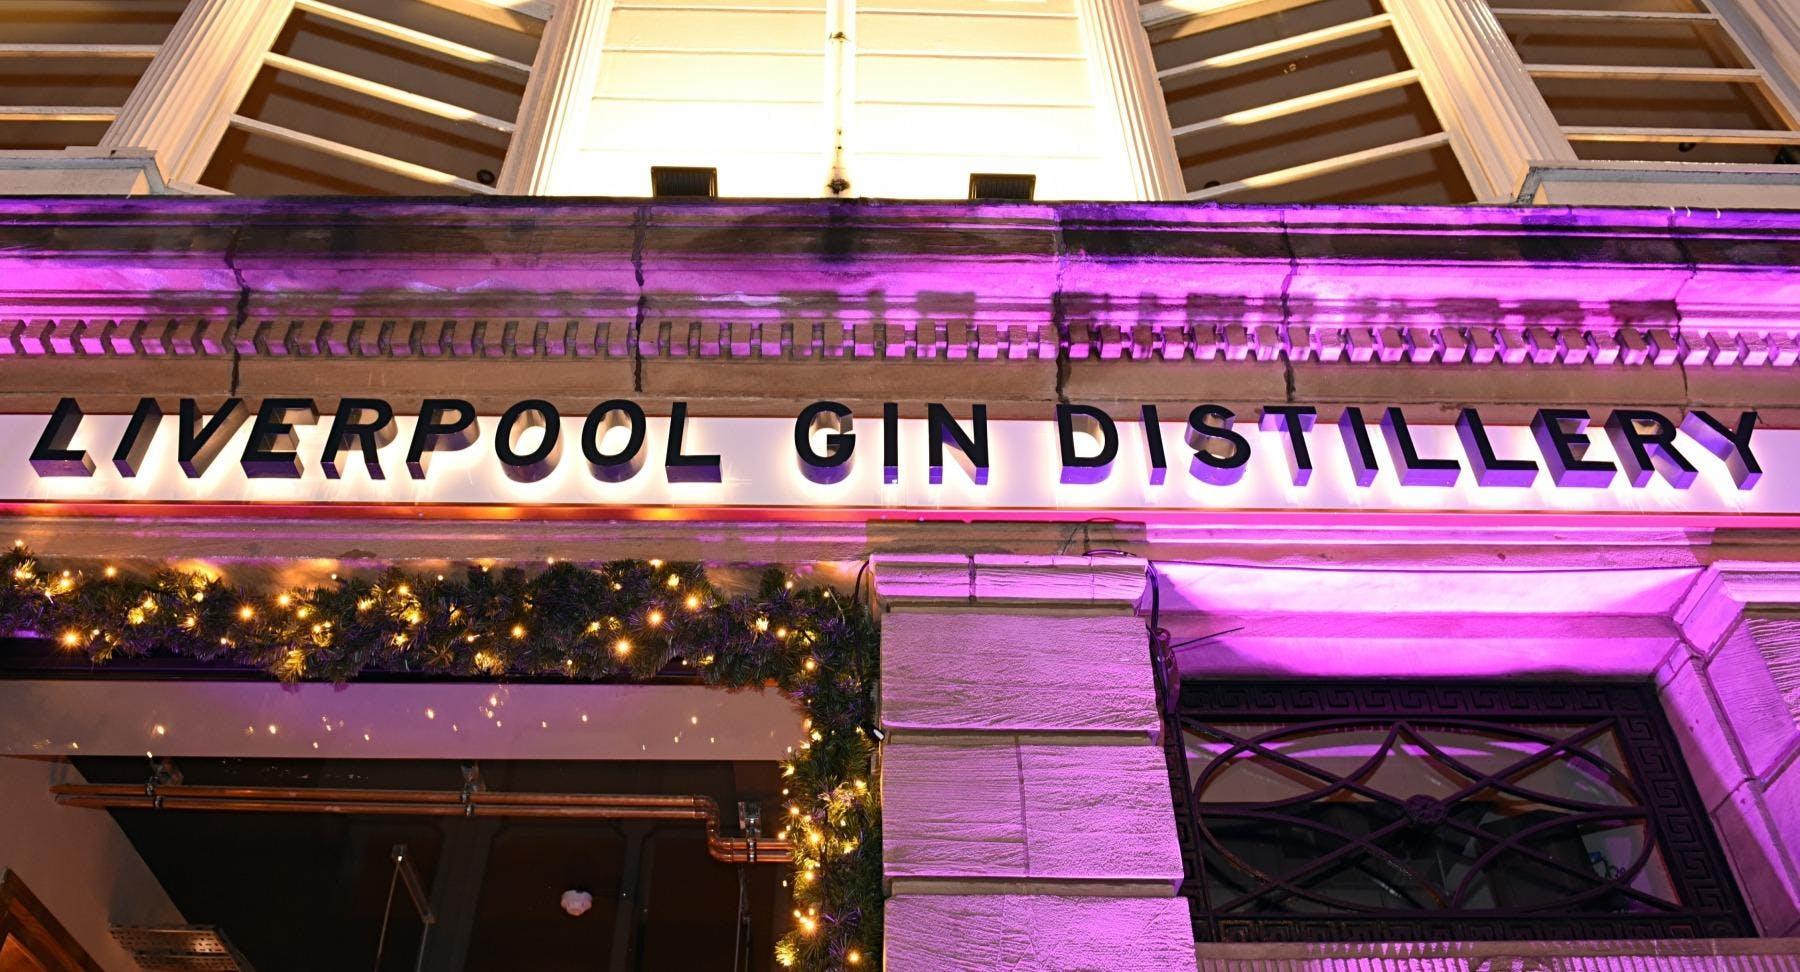 Liverpool Gin Distillery